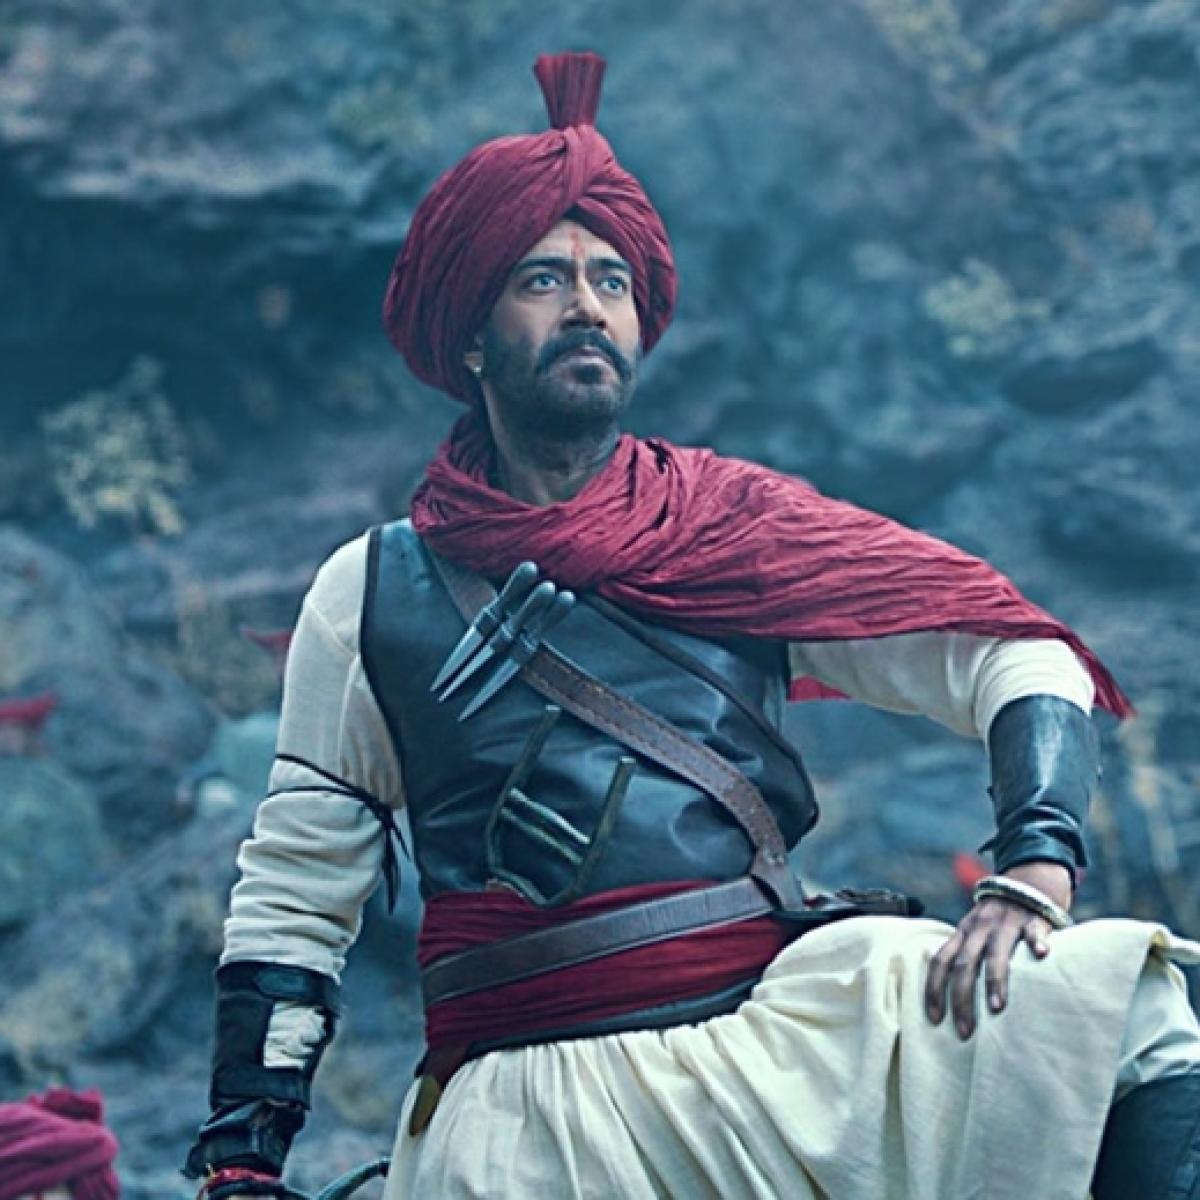 Tanhaji: The Unsung Warrior: Ajay Devgn's magnum opus mints Rs 61.93 crore over weekend